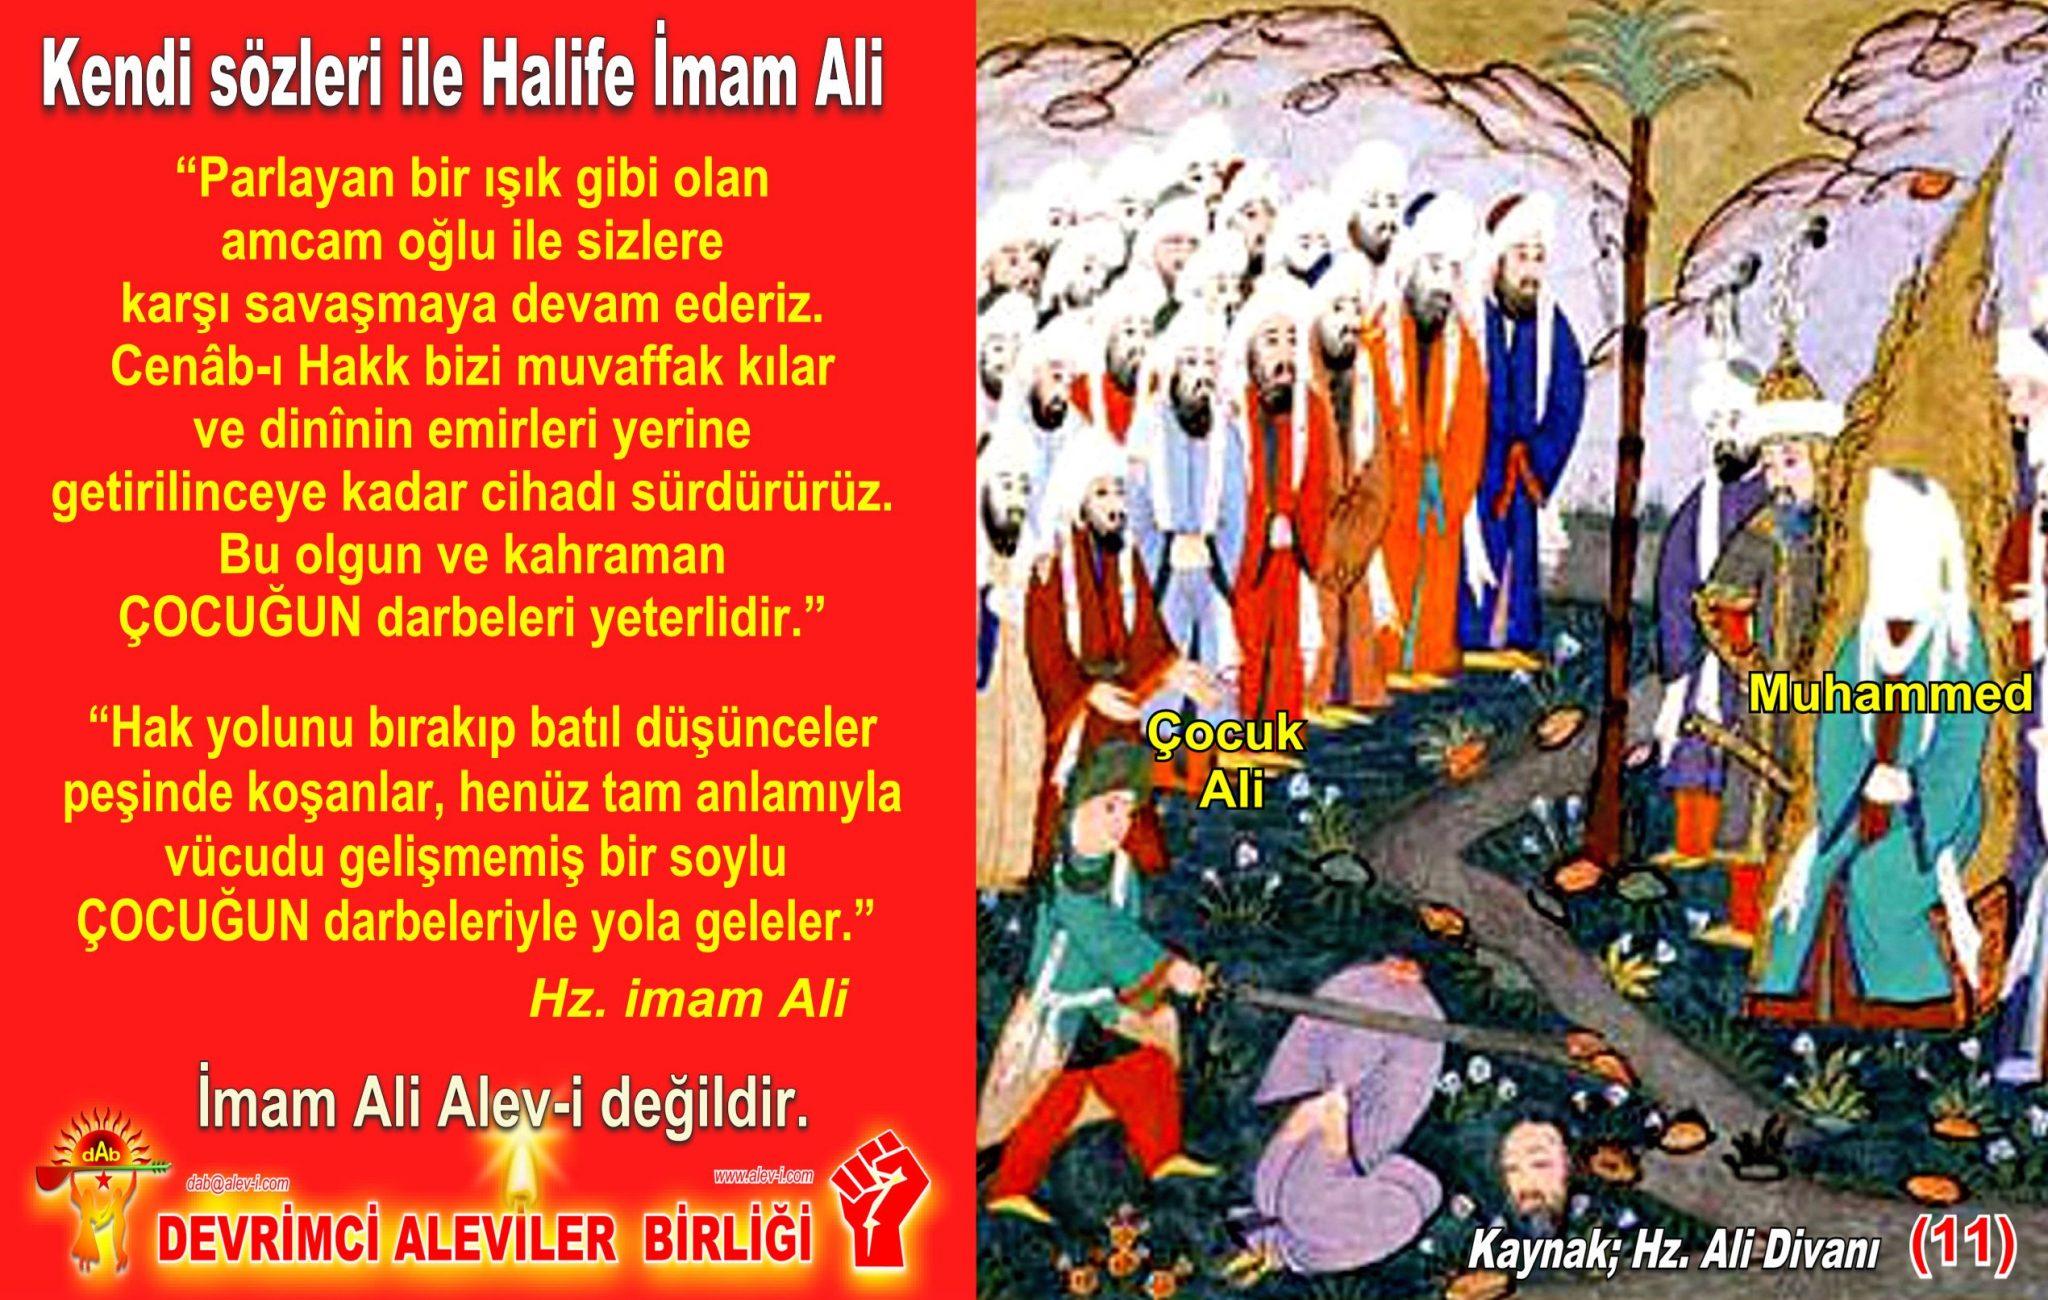 11 Hz imam Ali divani Alevi bektasi kizilbas pir sultan devrimci aleviler birligi DAB Feramuz Sah Acar